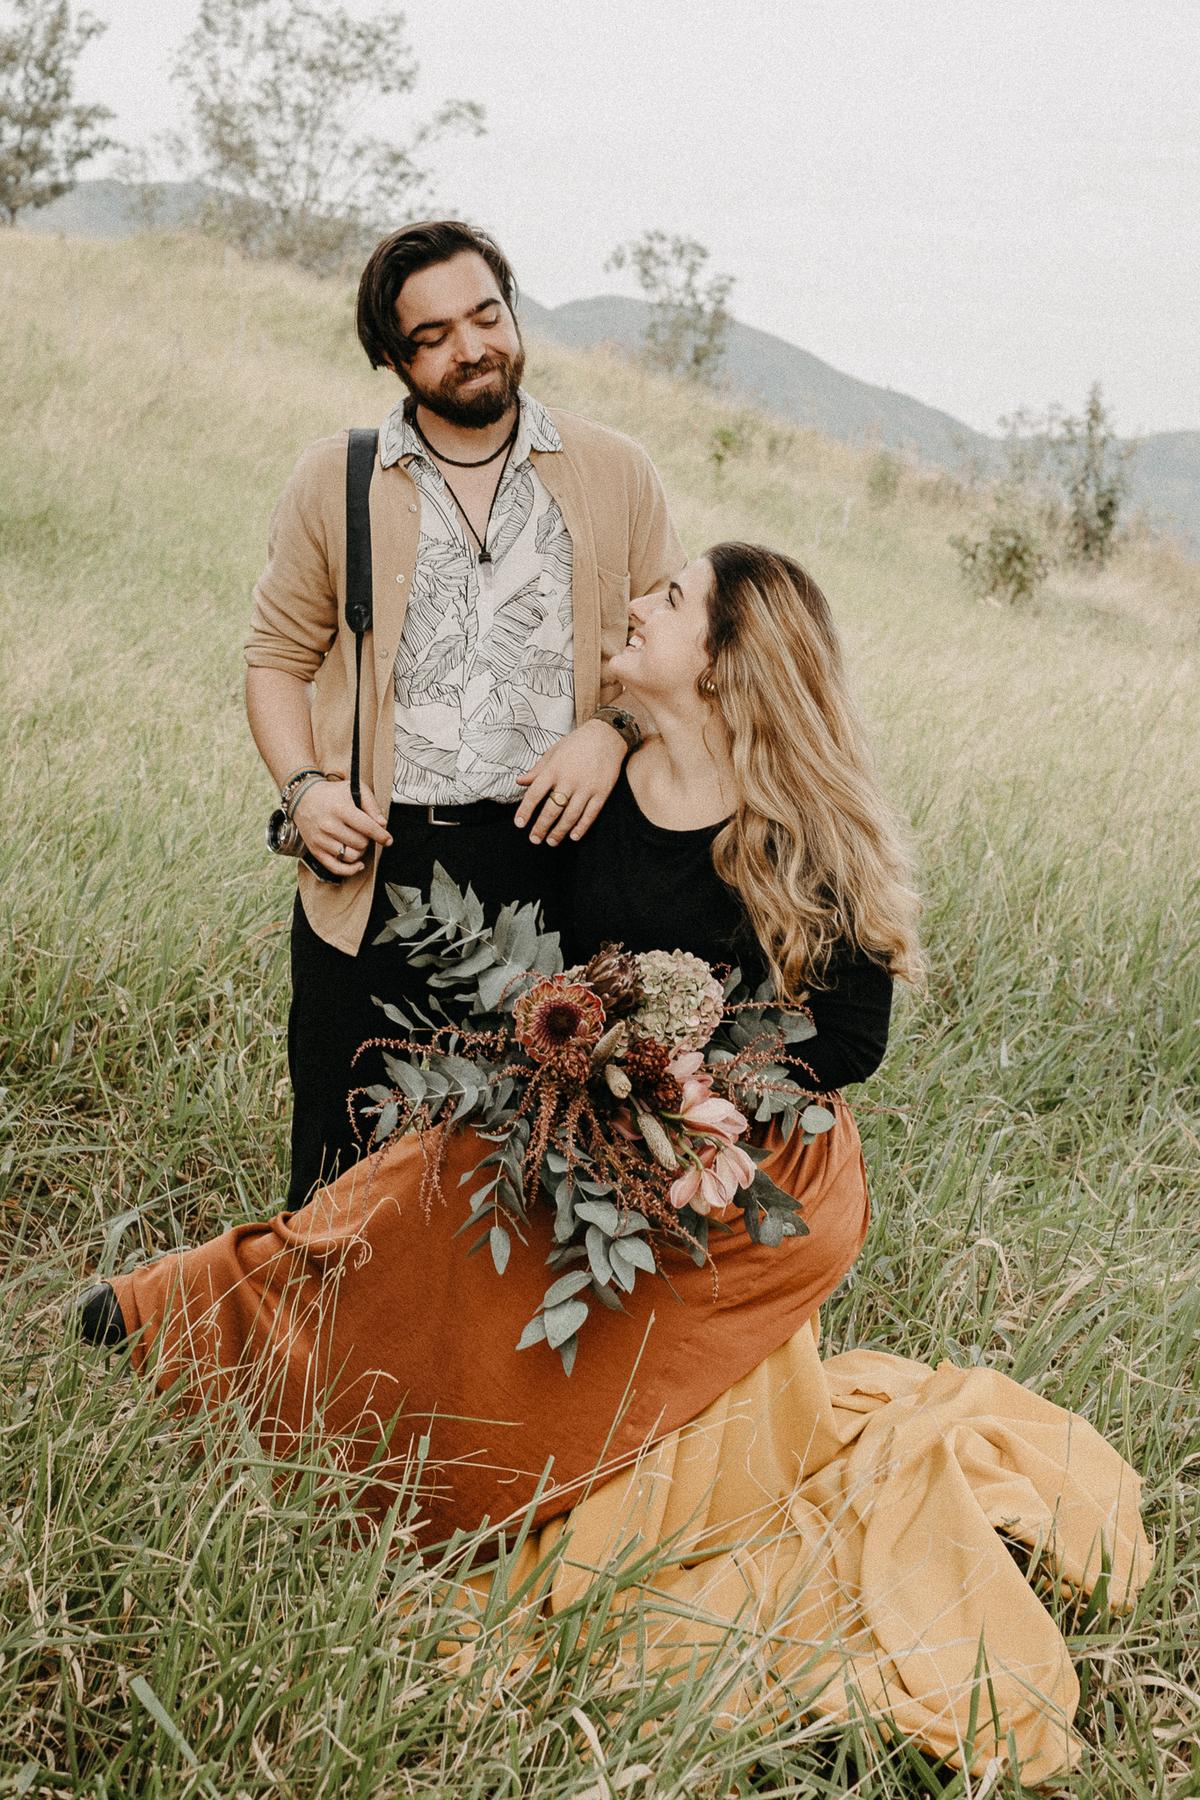 ensaio pre casamento ensaio autoral noivos artistas elopement pirapora do bom jesus por caio henrique